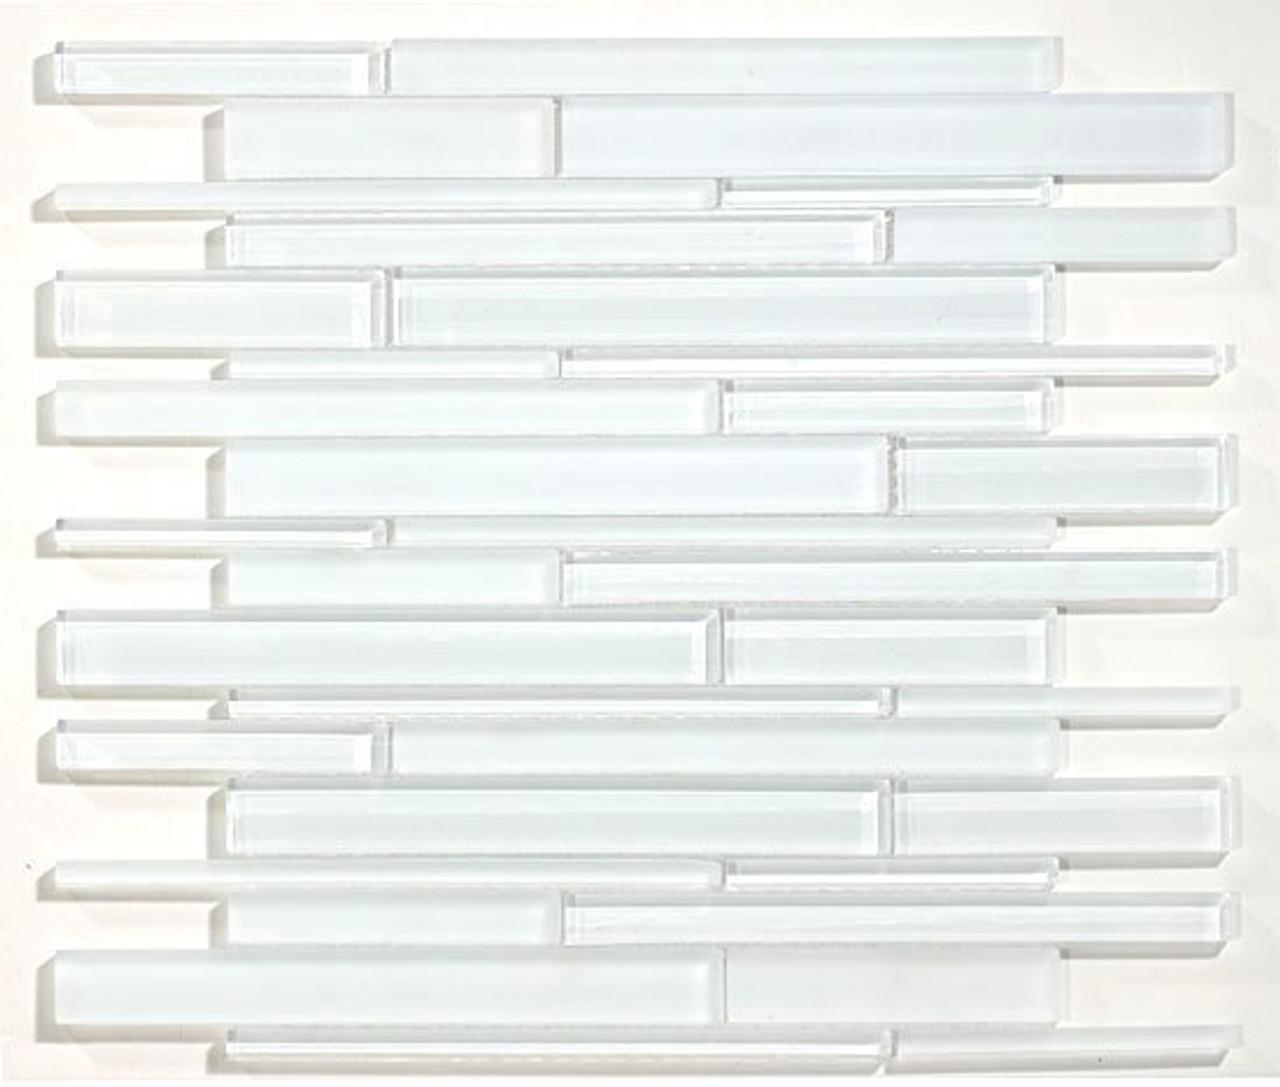 Bella Glass Tiles Cane Series Glass Tiles CN25 Super White